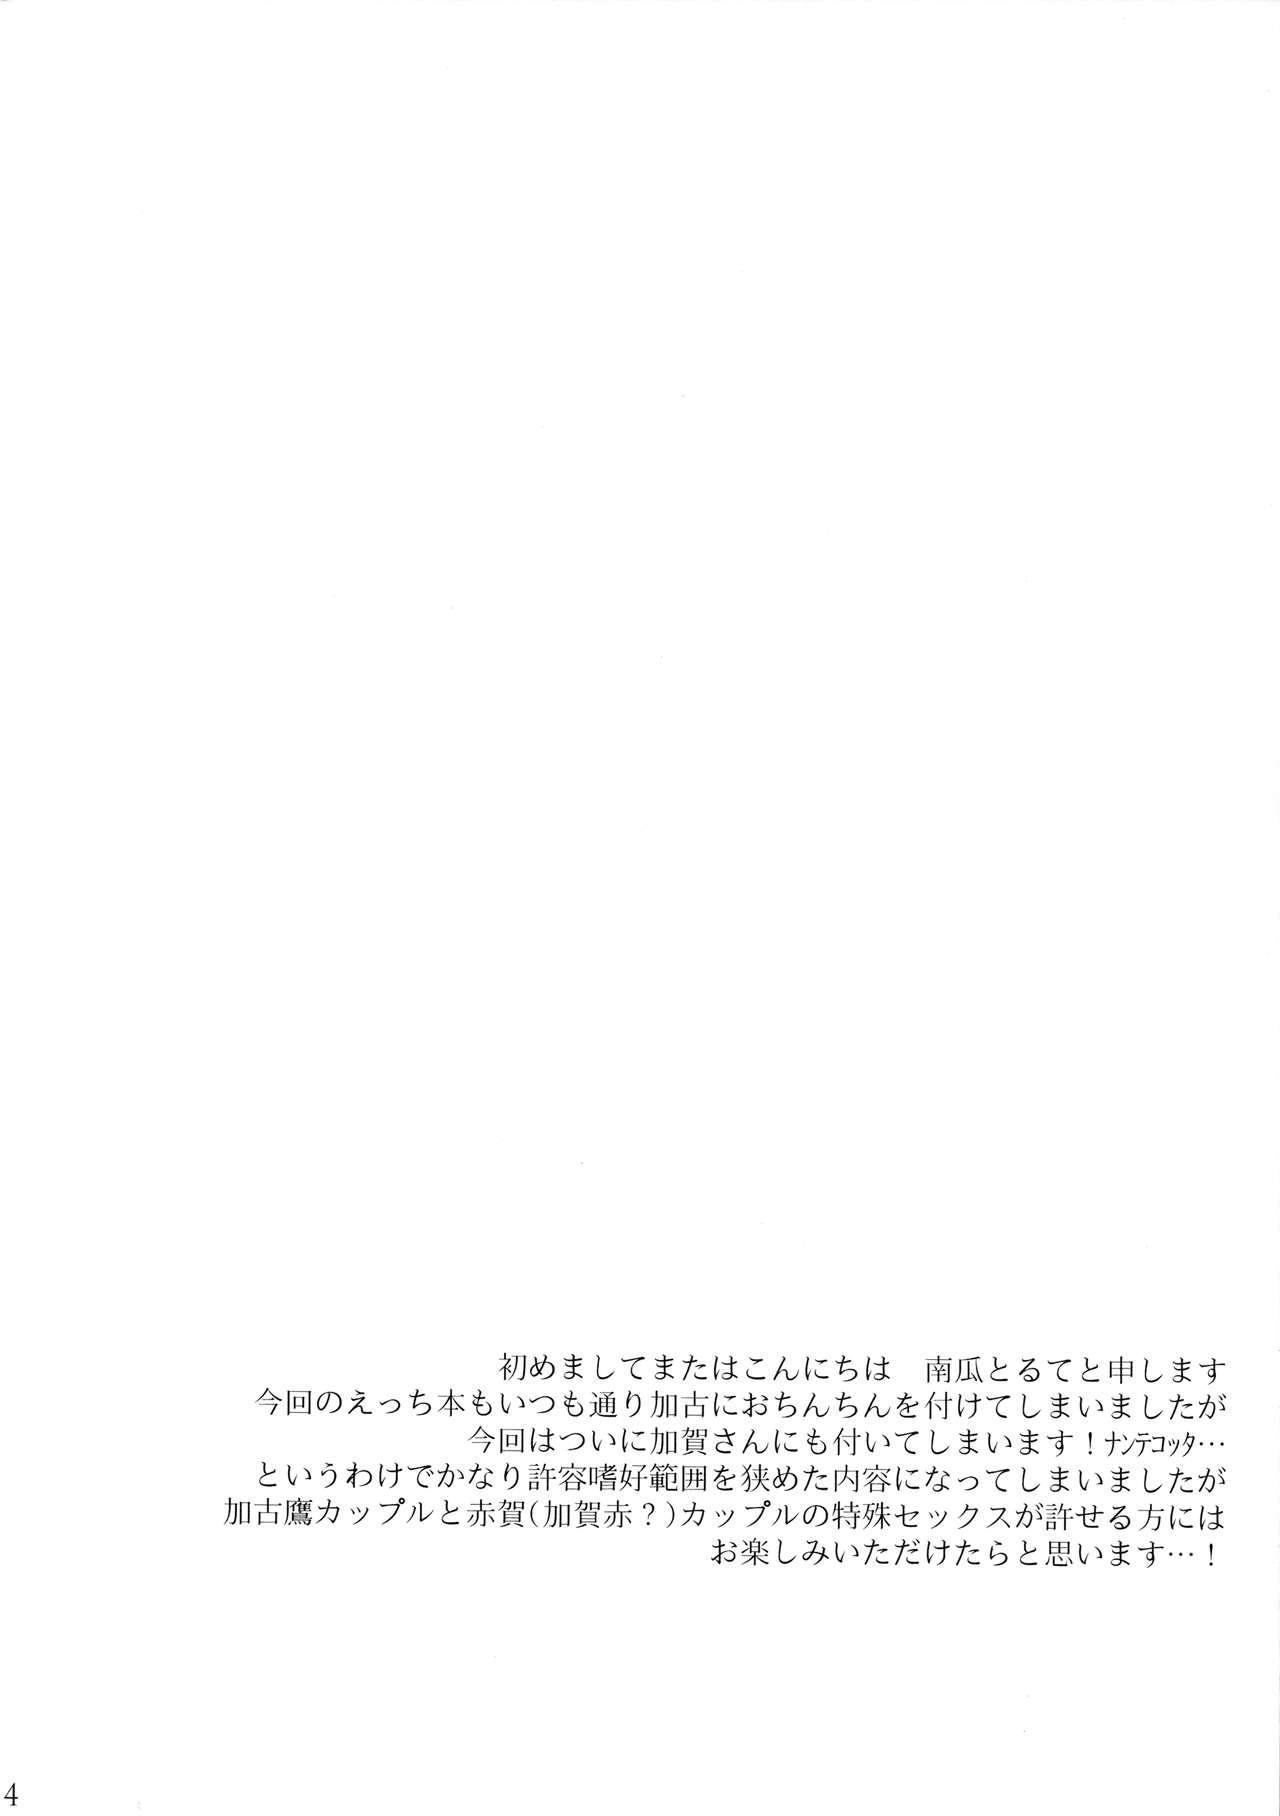 Toaru Koibito-tachi no Futari Ecchi 4